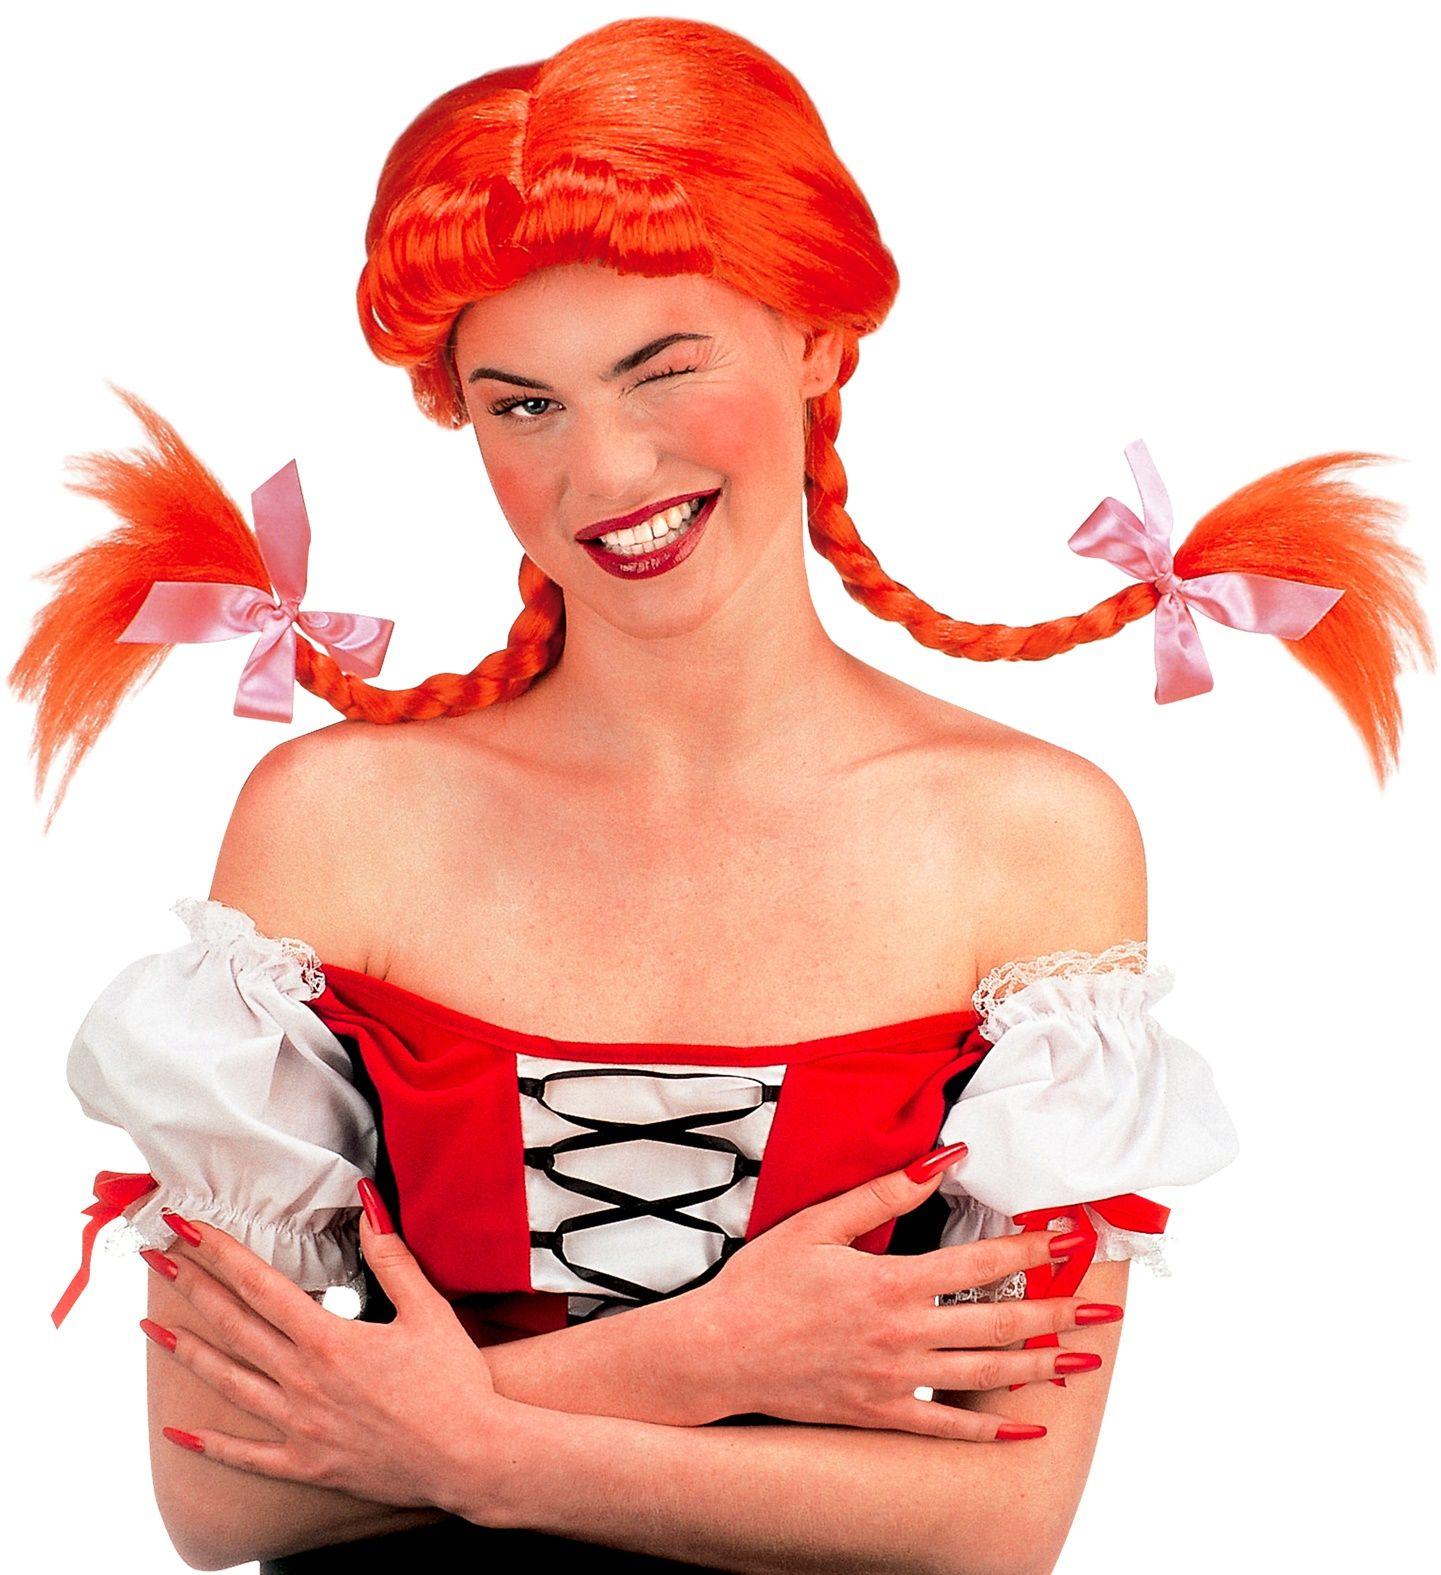 Rode Pippi Langkous kinder pruik